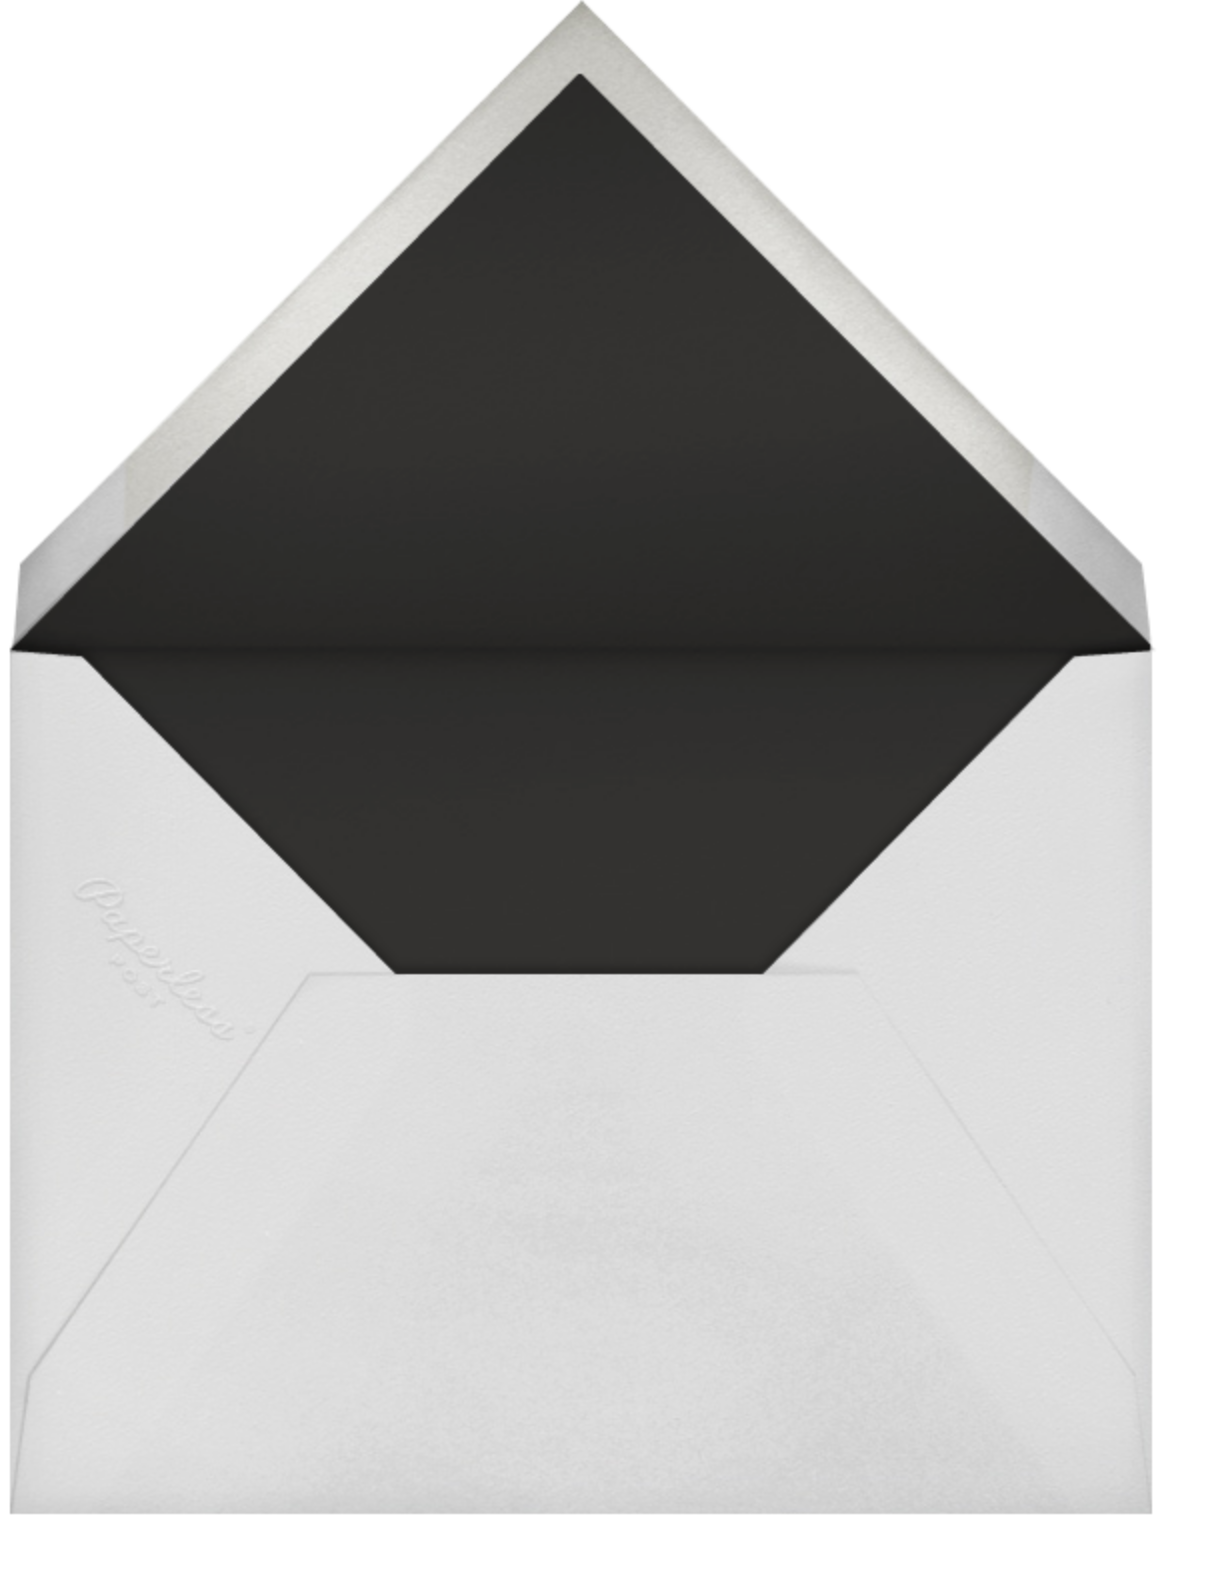 Tulip Dot (Save the Date) - Granita - Oscar de la Renta - Envelope